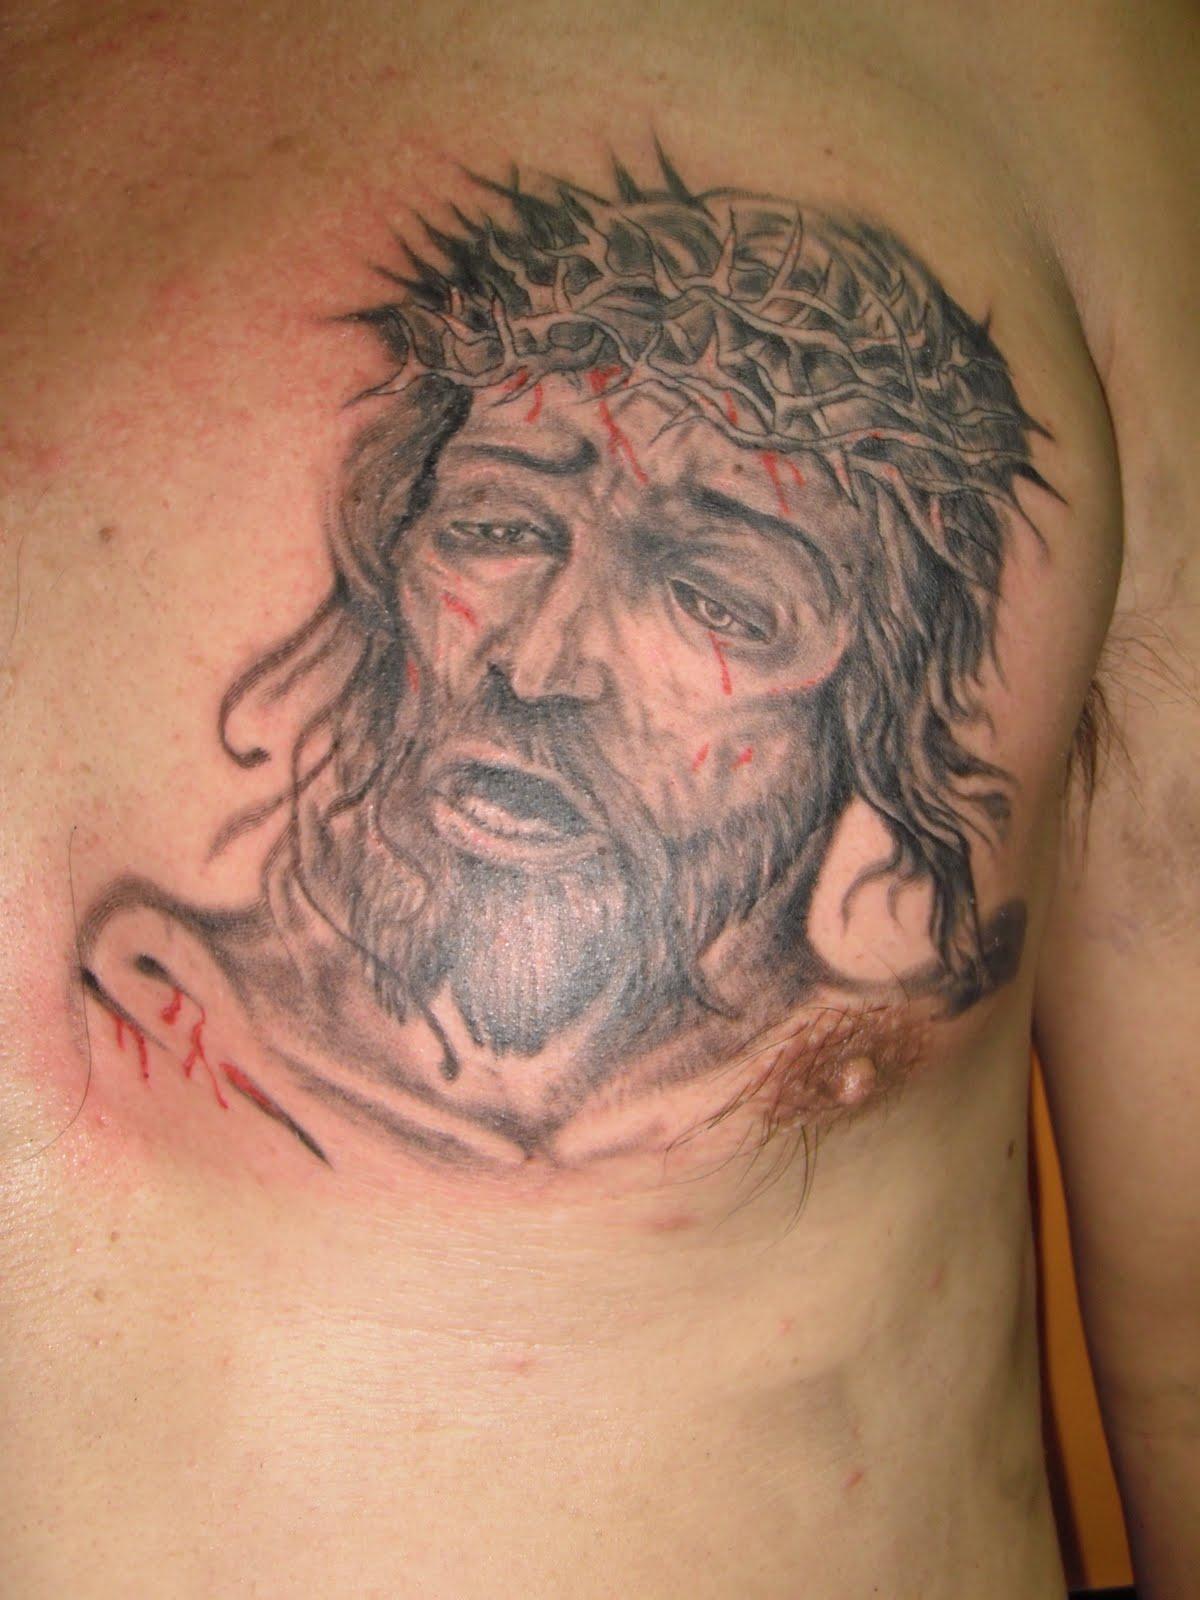 Тату лик иисуса фото